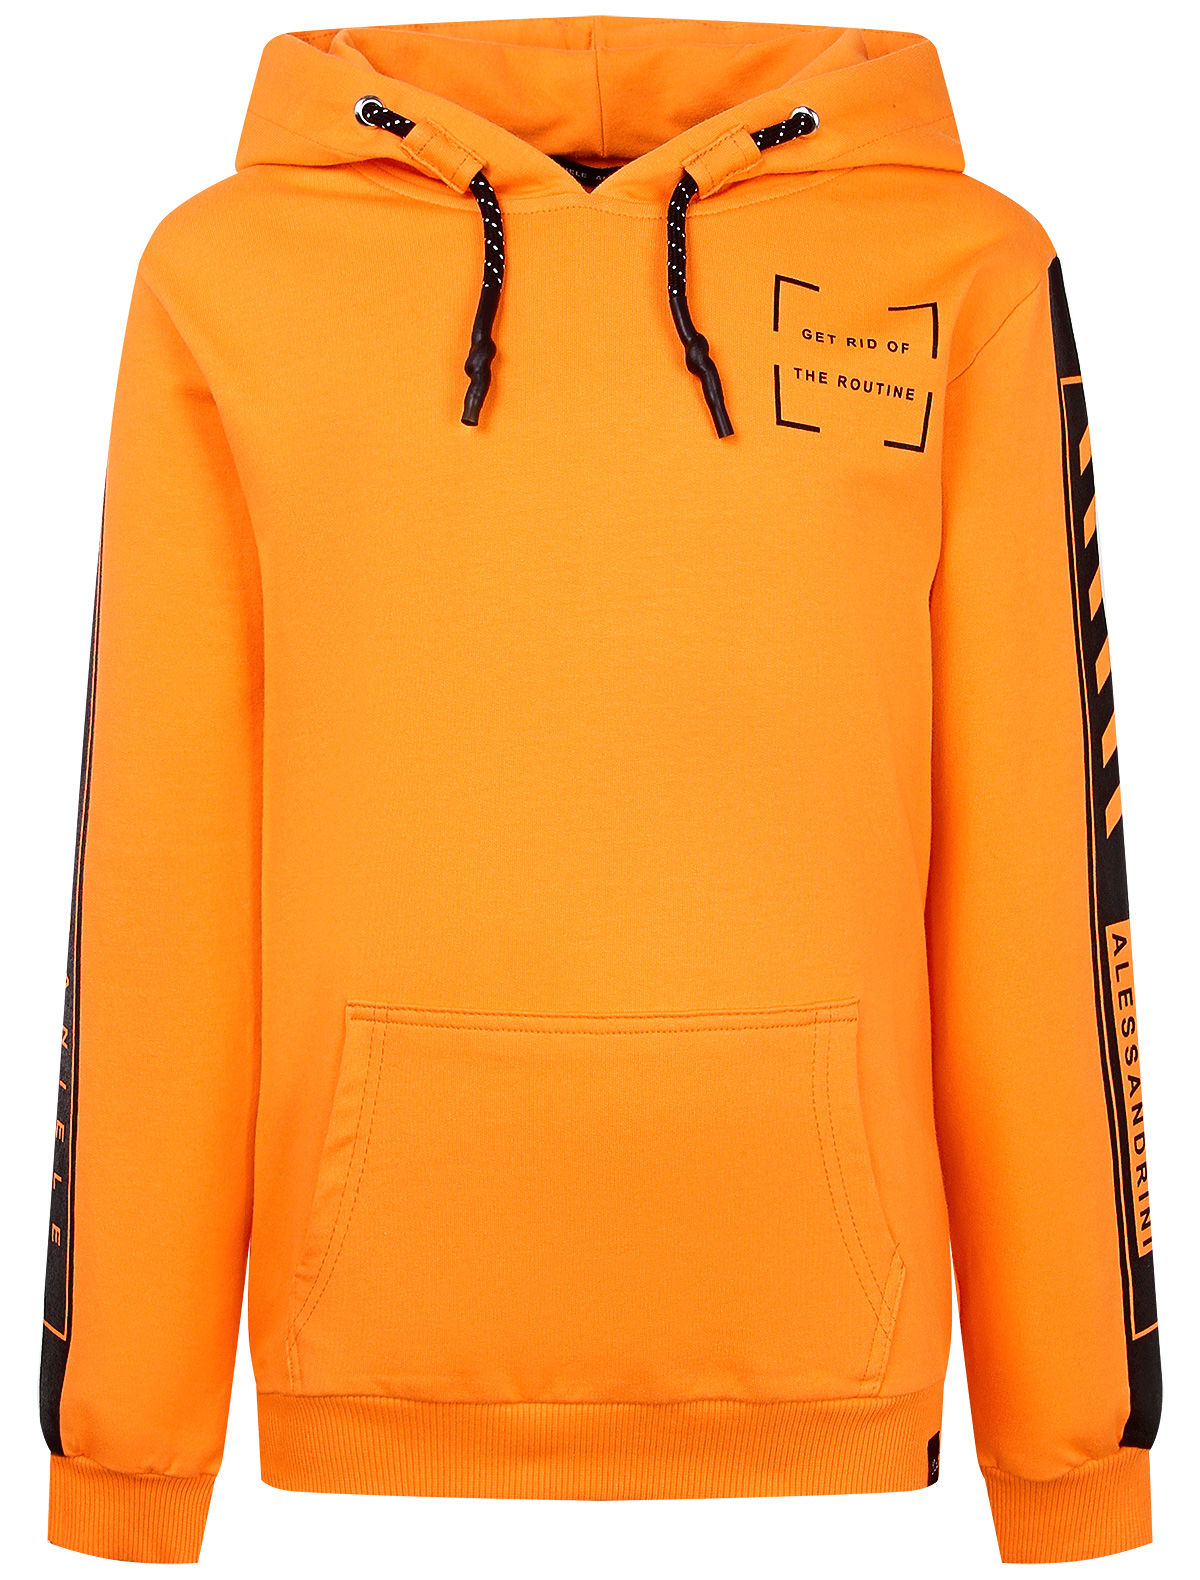 Купить 2262963, Худи Daniele Alessandrini, оранжевый, Мужской, 0094519083272